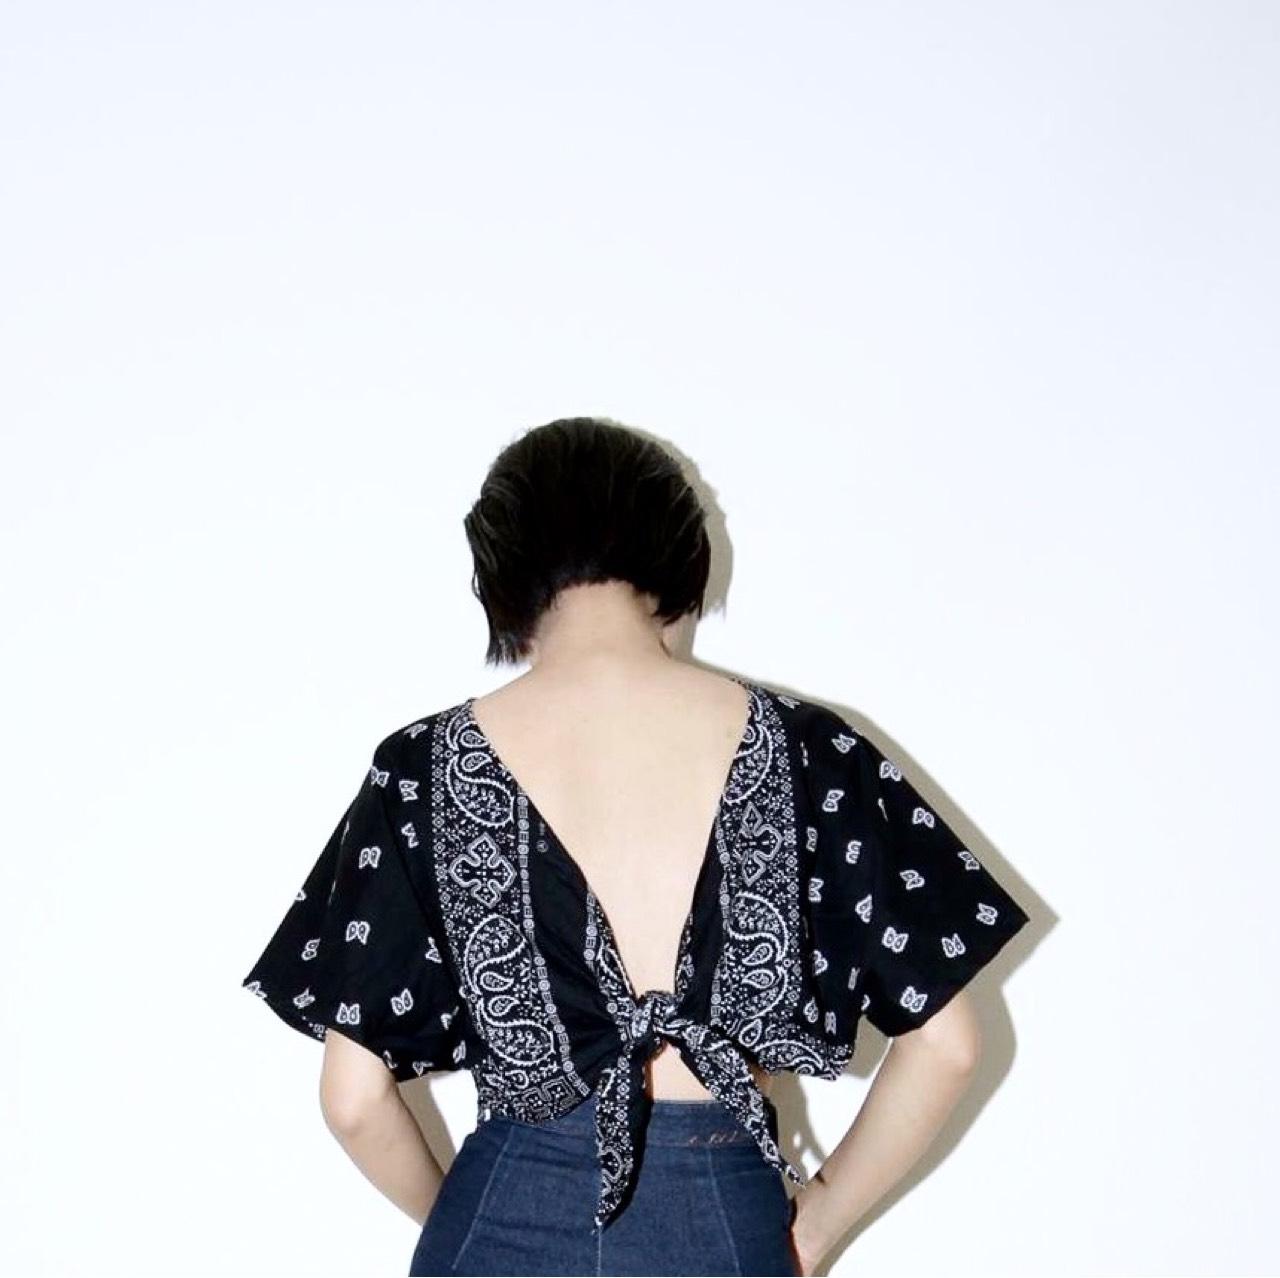 BeMindCloset,เสื้อครอป,เสื้อผู้หญิง,เสื้อผูกหลัง,เสื้อผูก,ผูกหลัง,เสื้อแขนสั้น